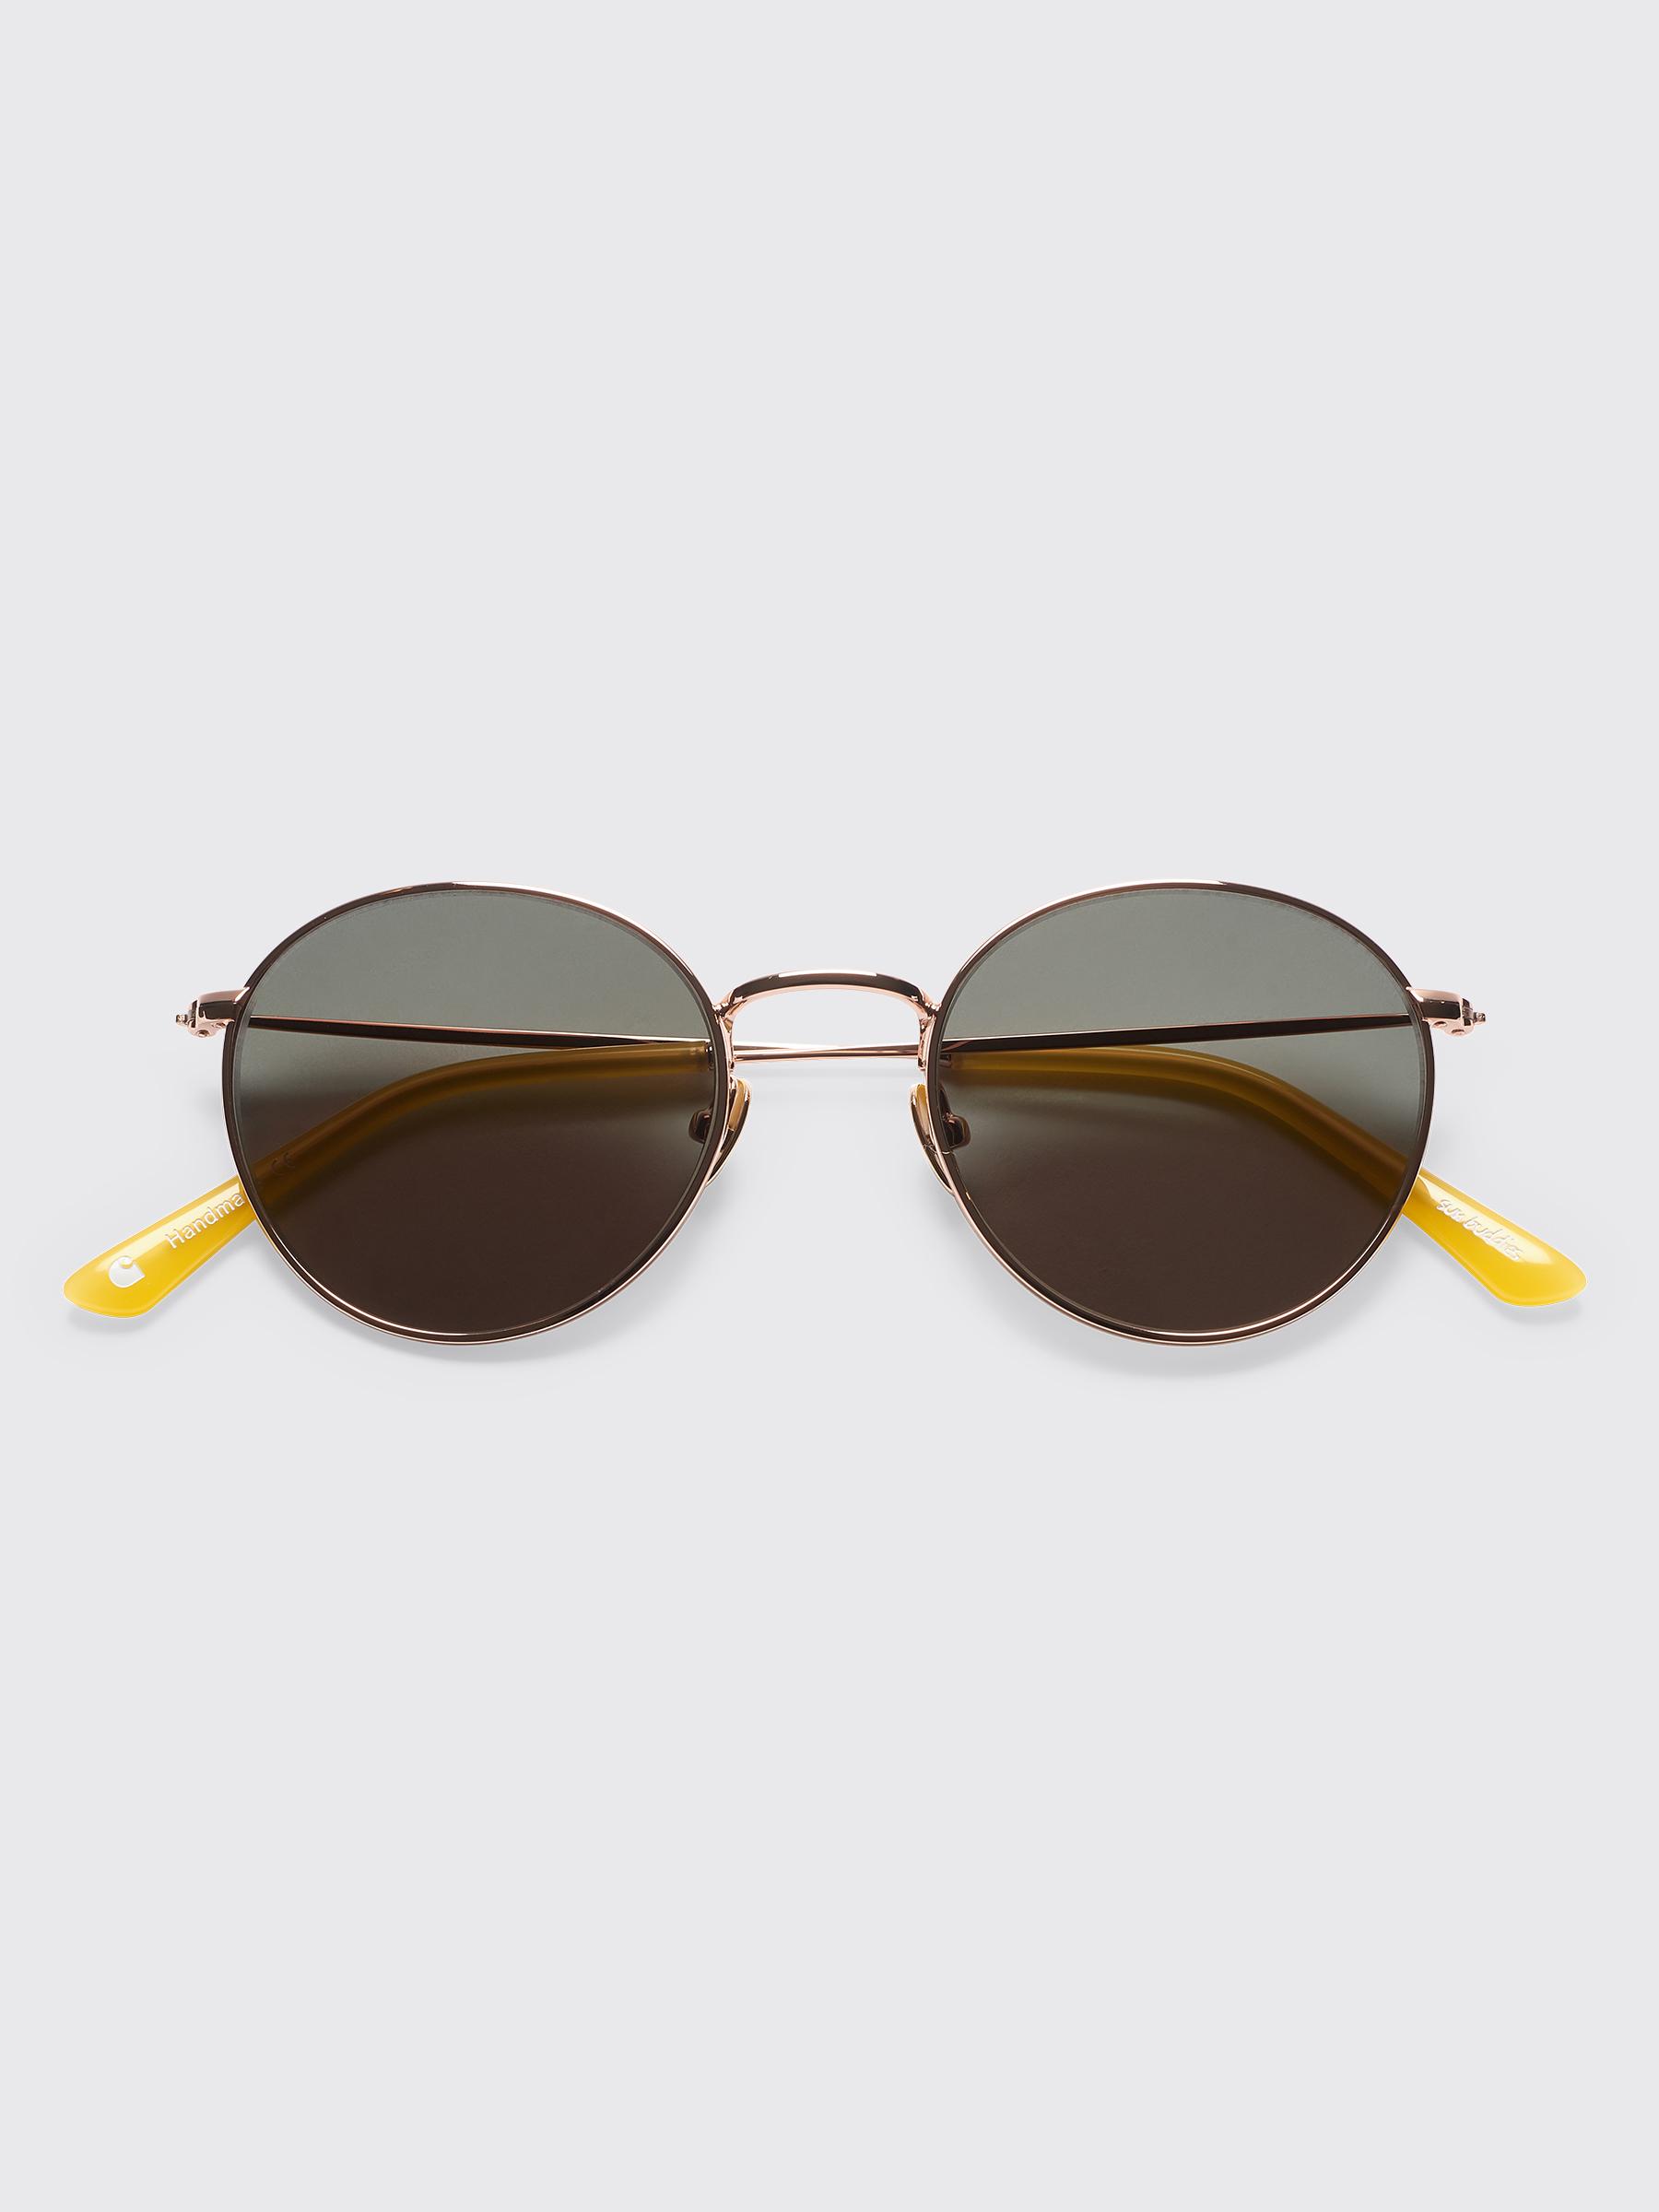 7dd6e66f6045 Très Bien - Sun Buddies for Carhartt WIP Jean Sunglasses Rose Gold